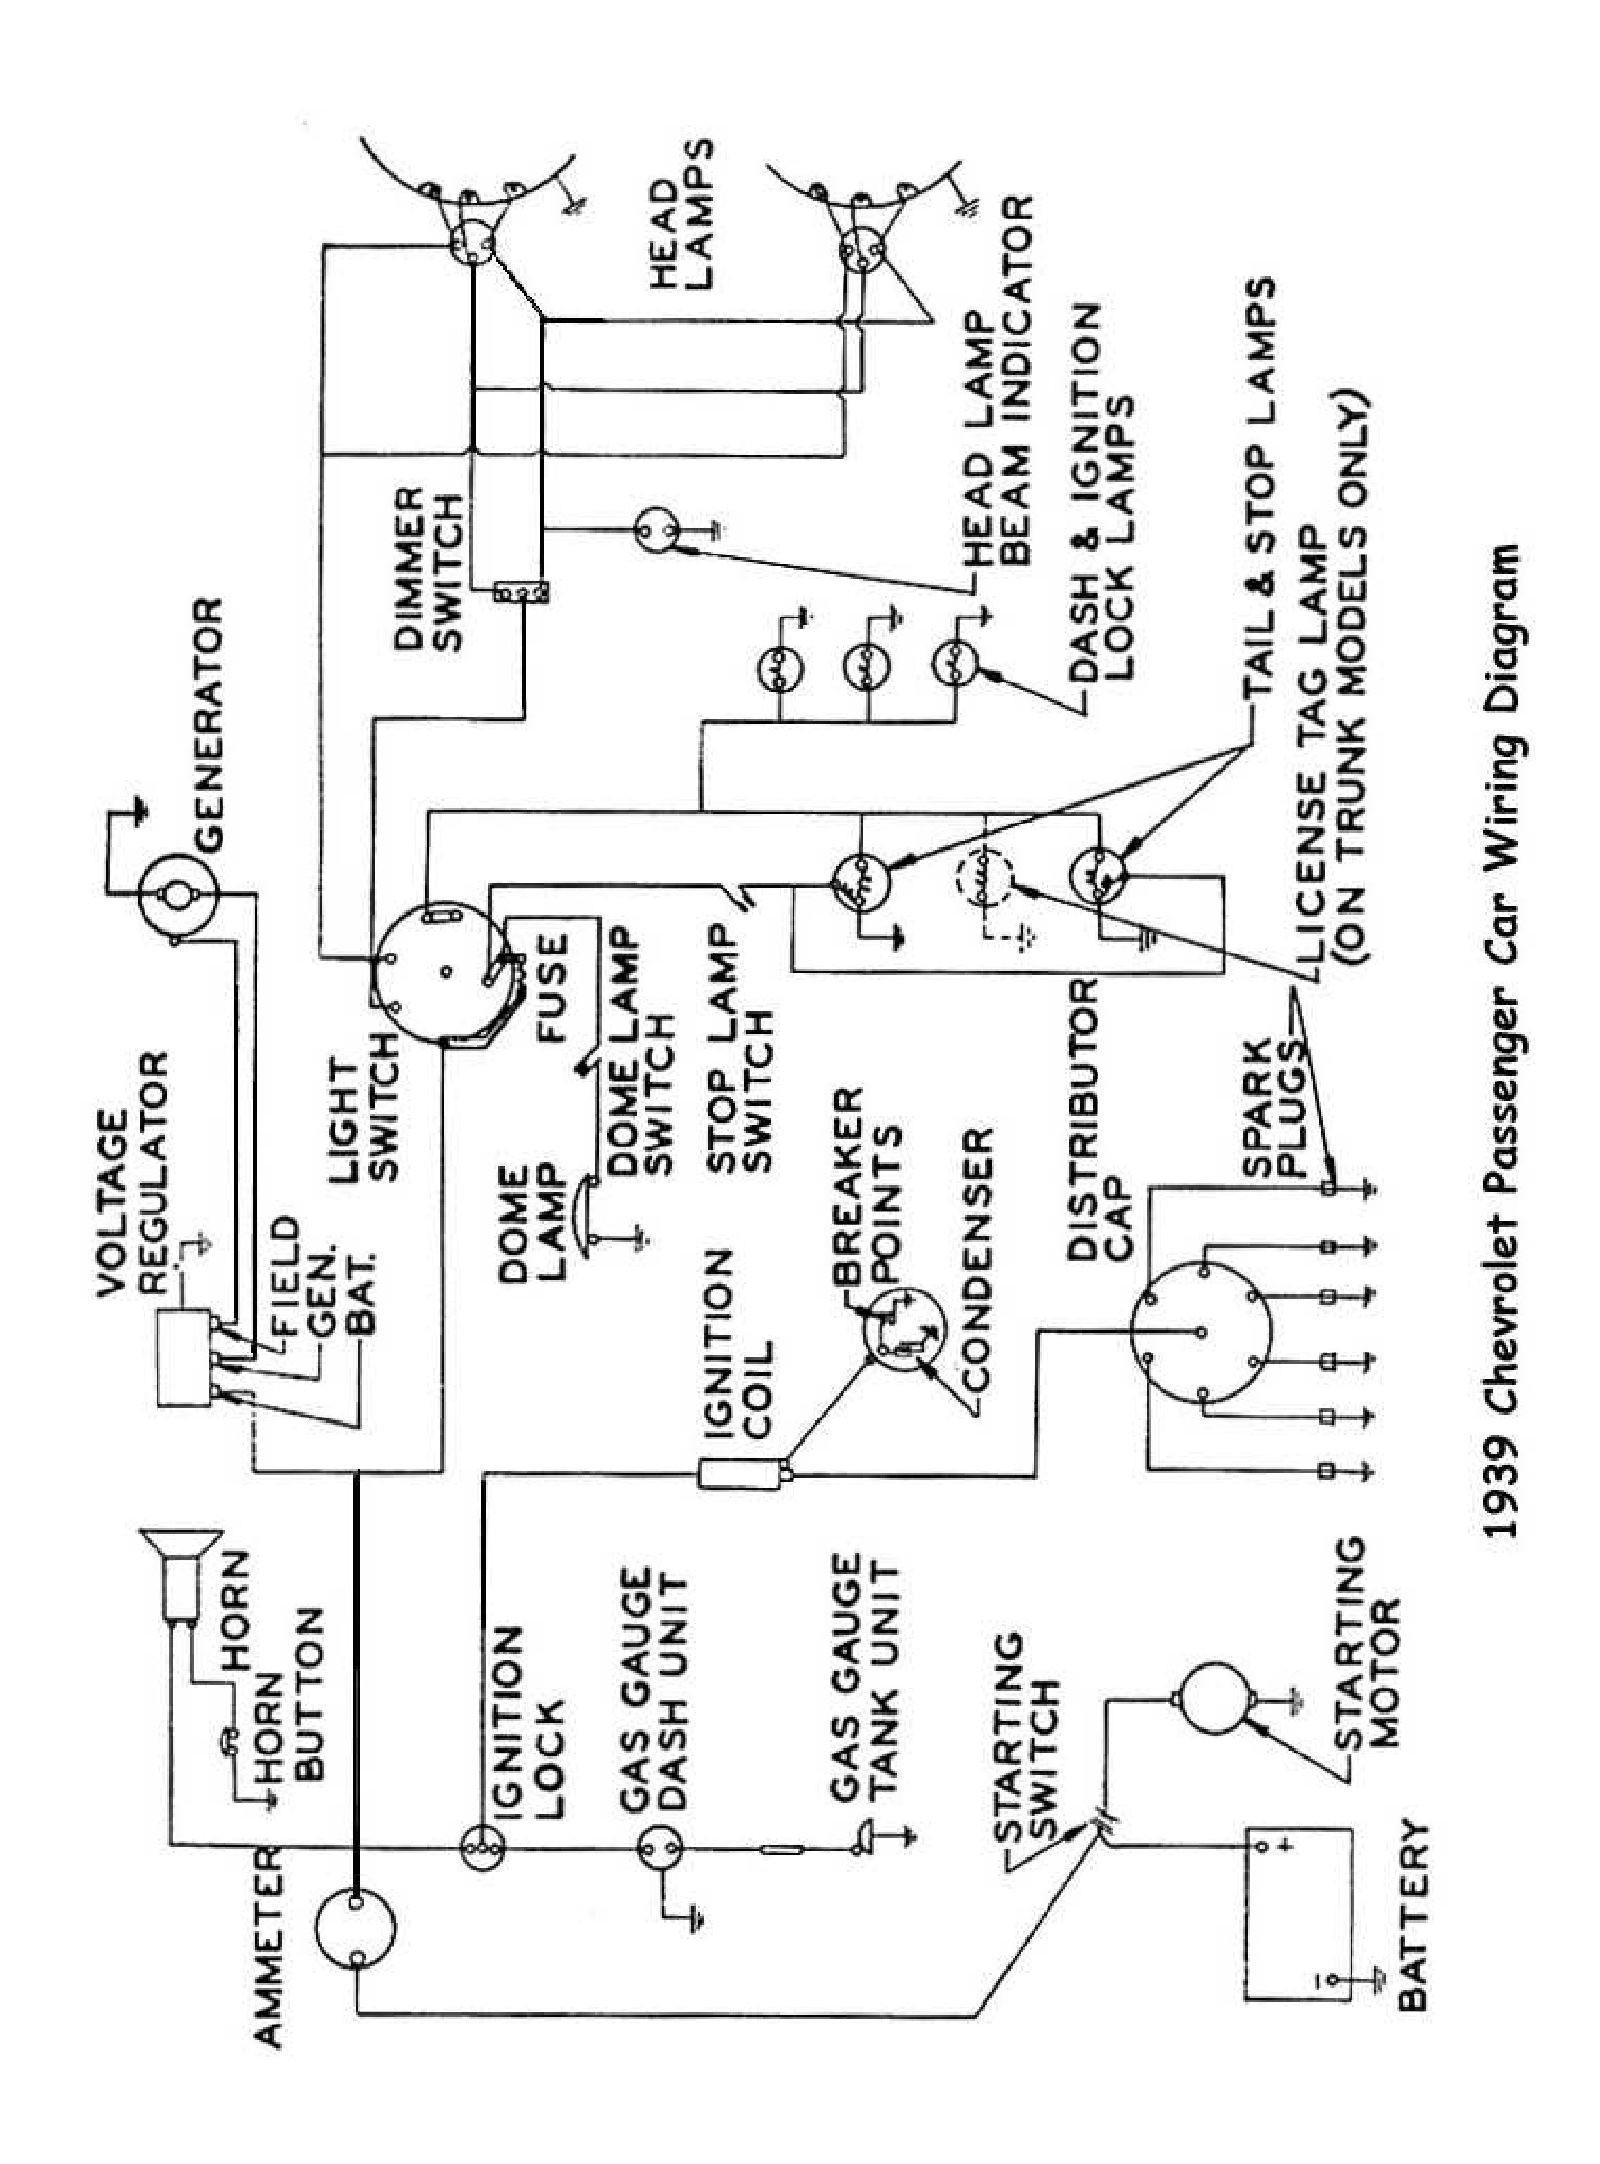 dome light switch wiring diagram house wiring diagram symbols u2022 rh mollusksurfshopnyc com